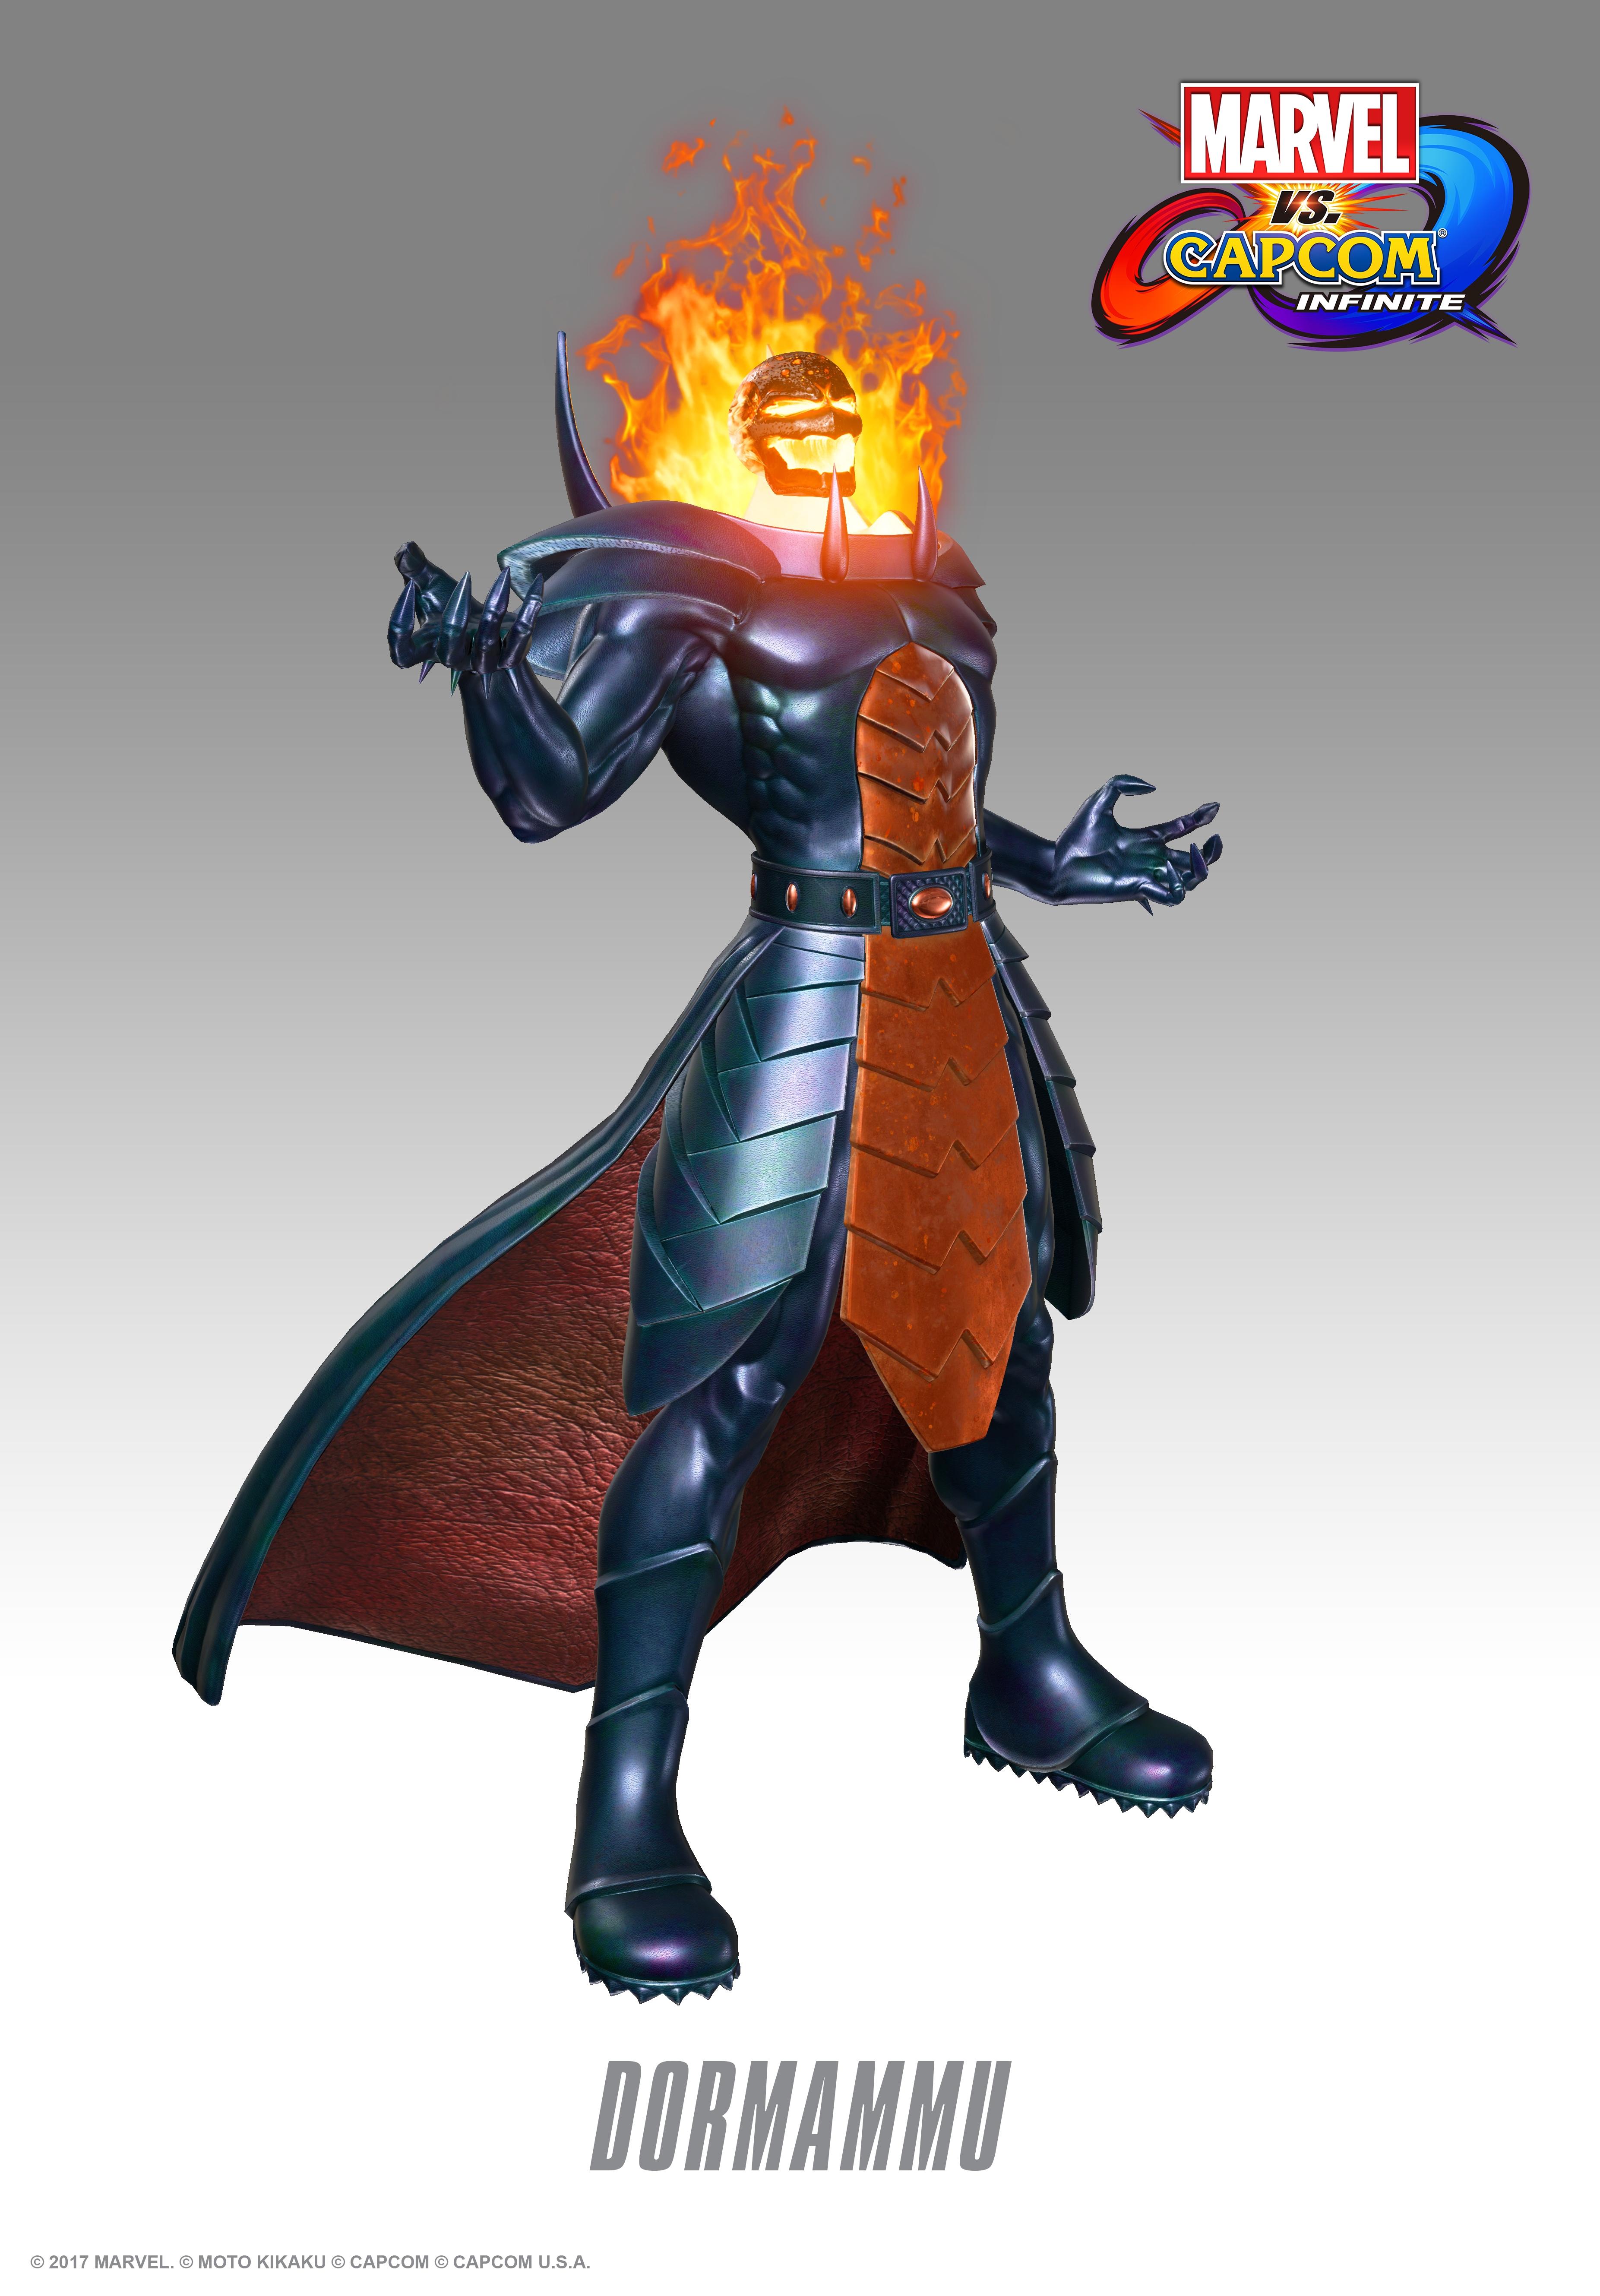 Дормамму - Marvel vs. Capcom: Infinite Арт, Персонаж